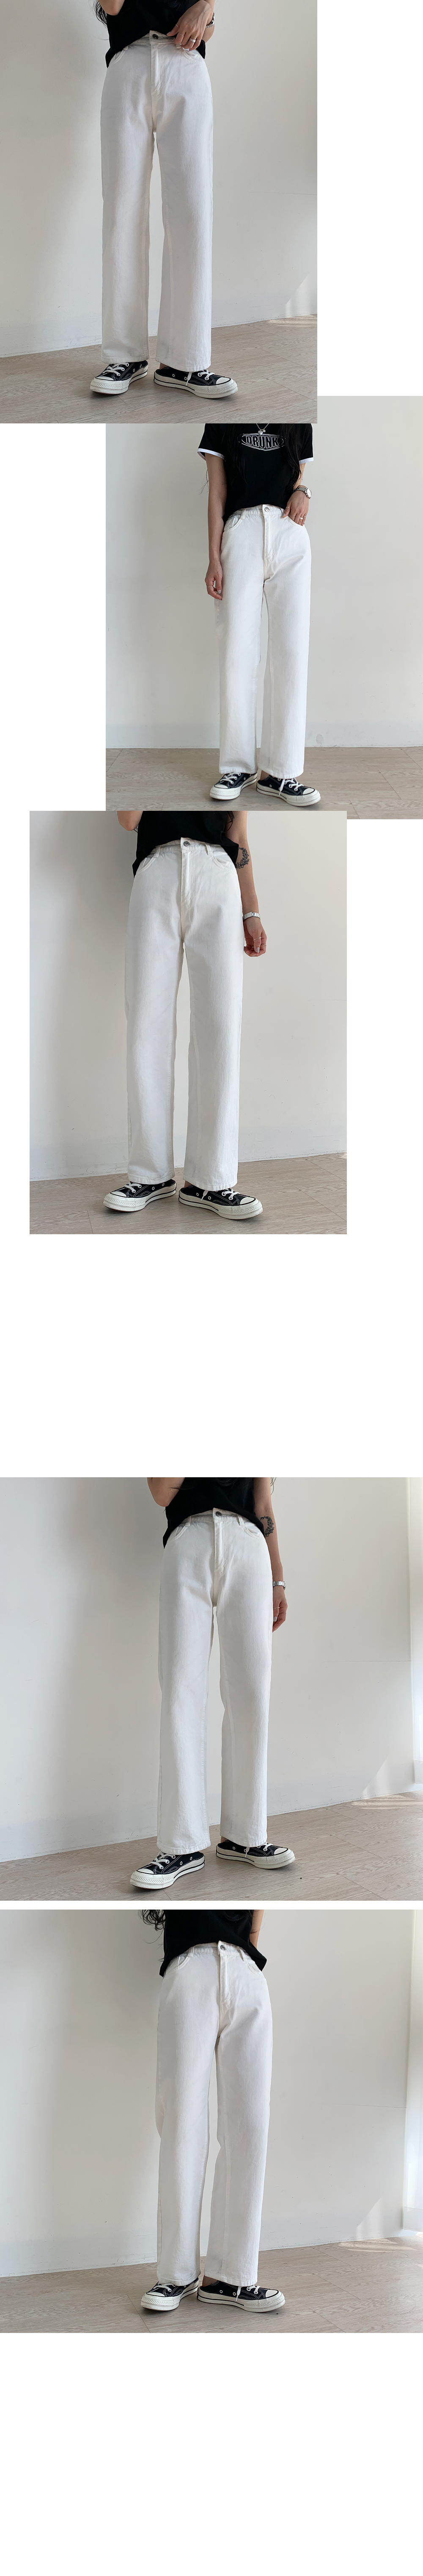 Dukin White Wide Pants